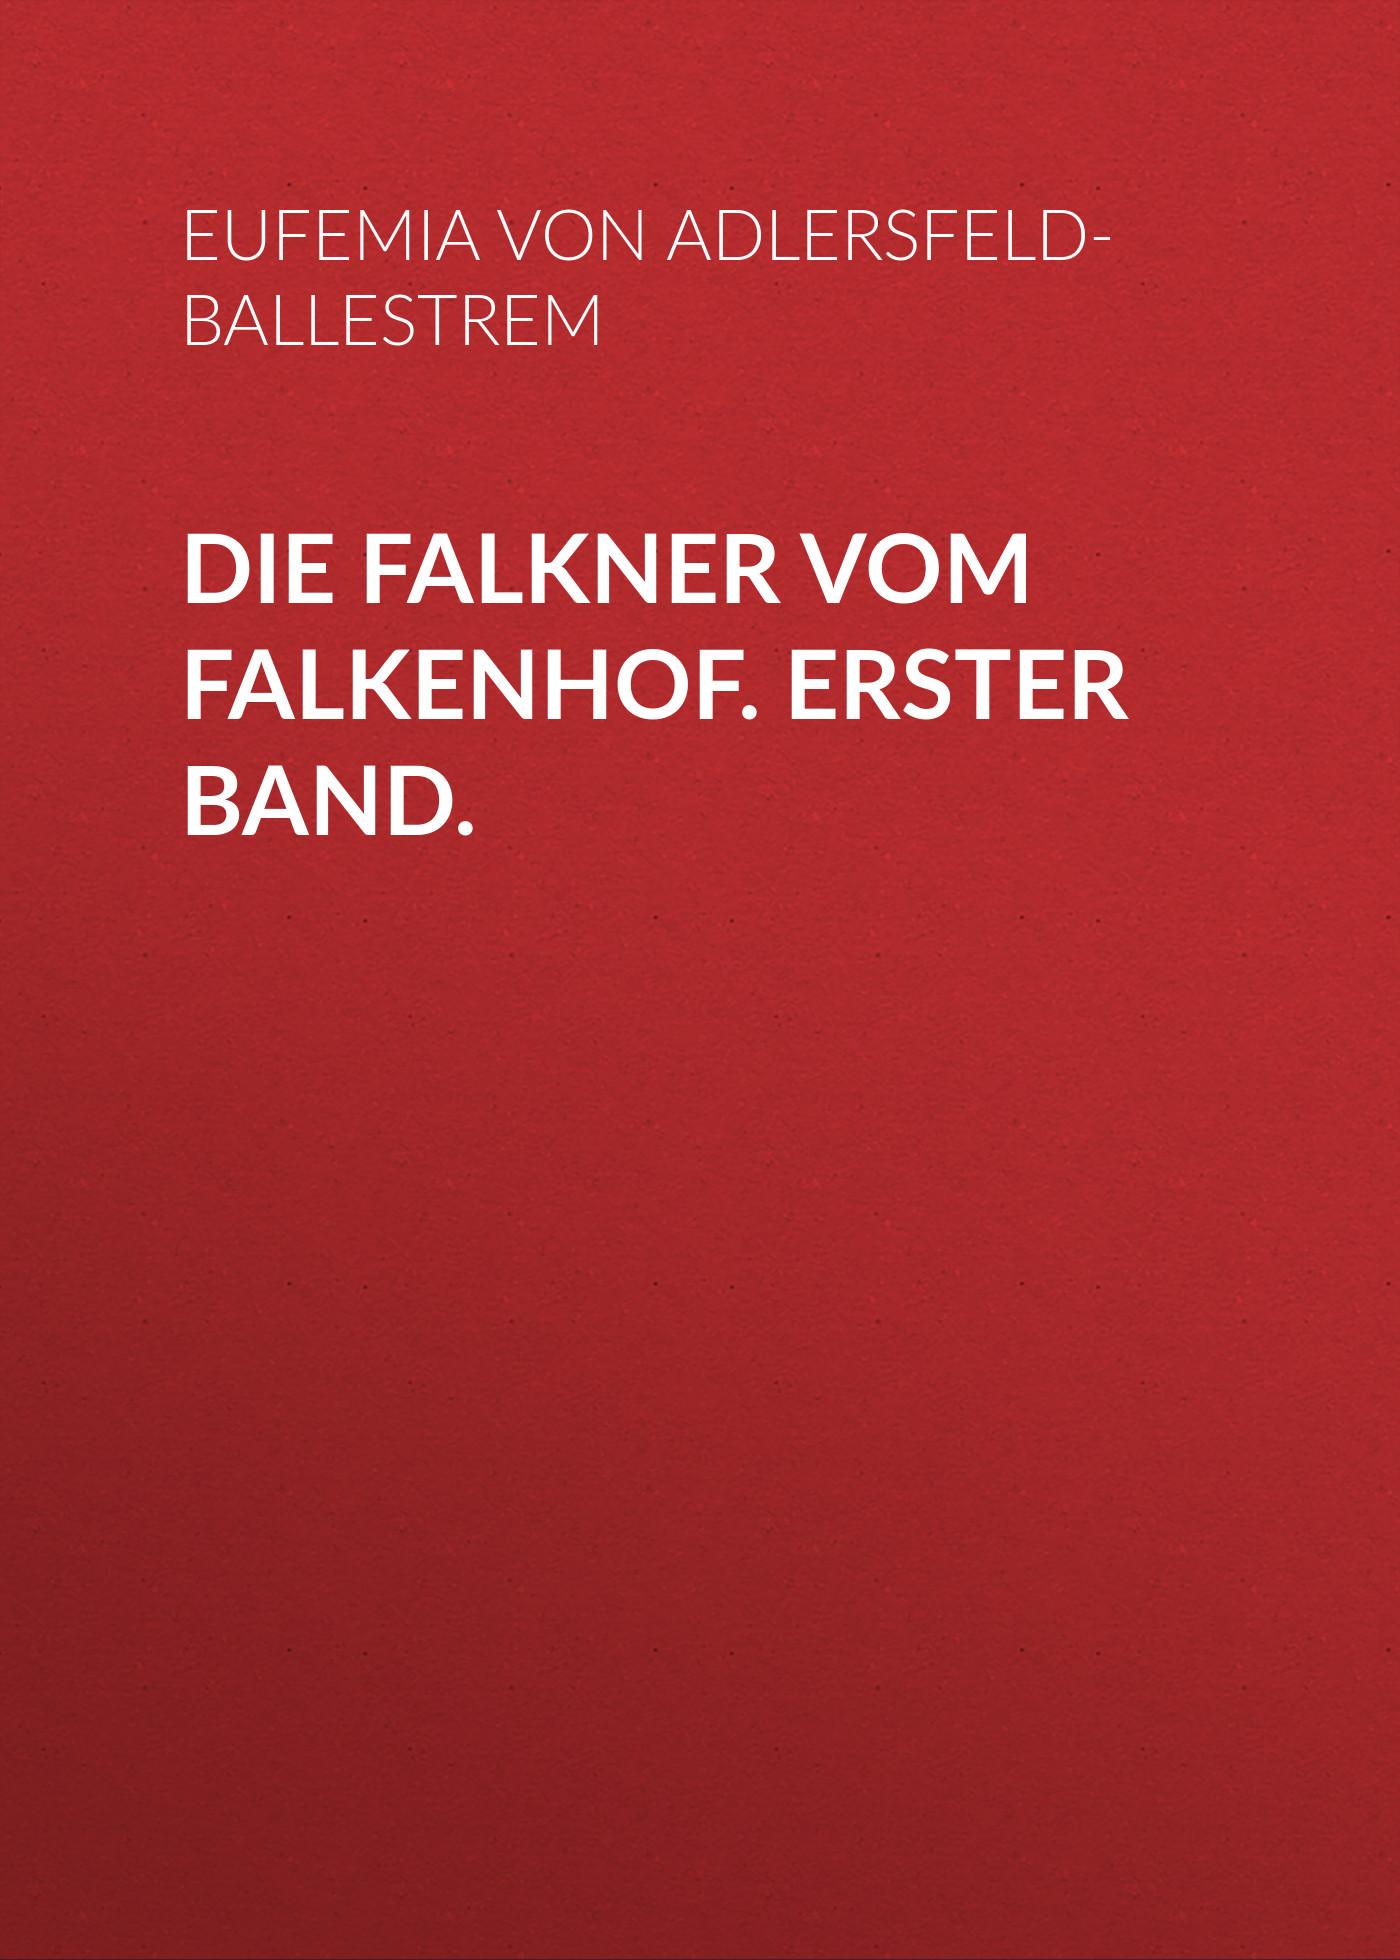 von Adlersfeld-Ballestrem Eufemia Die Falkner vom Falkenhof. Erster Band. цена и фото